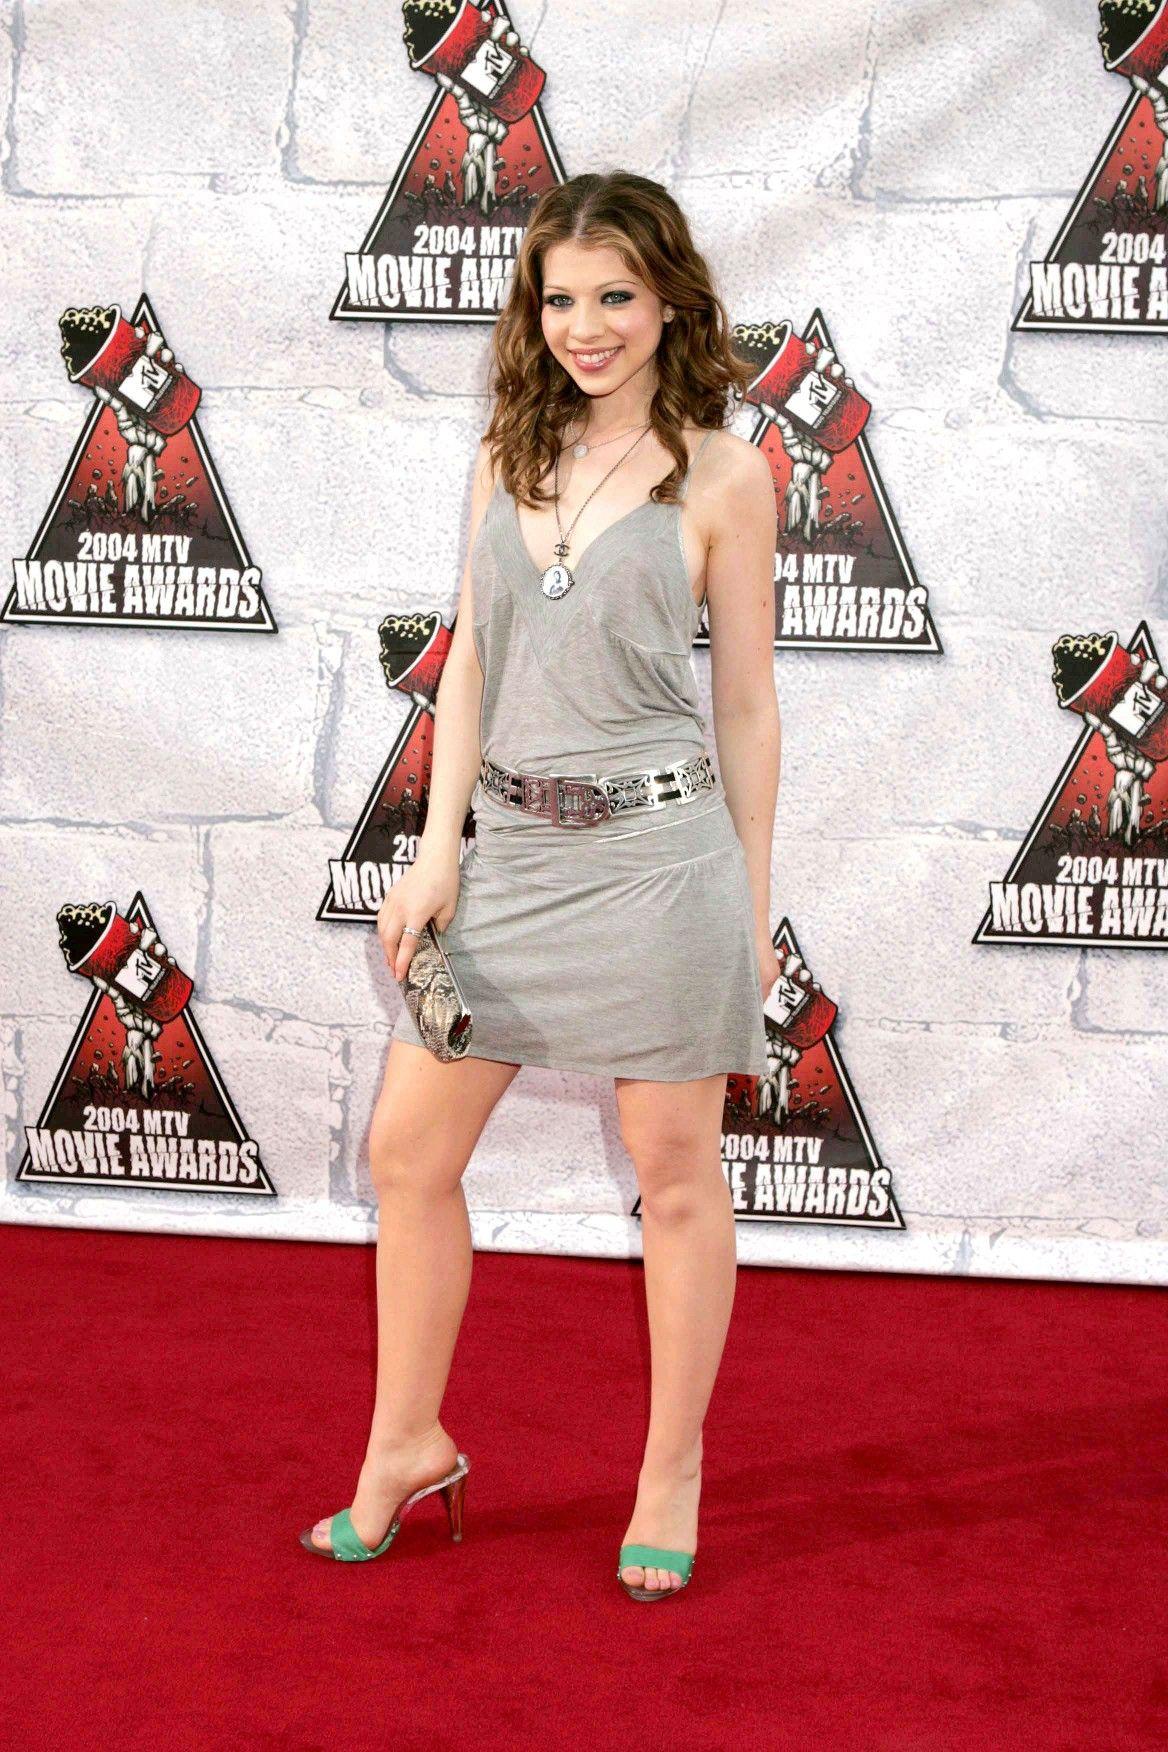 MTV Movie Awards 2004 - Michelle Trachtenberg  690cd4fdb3fca